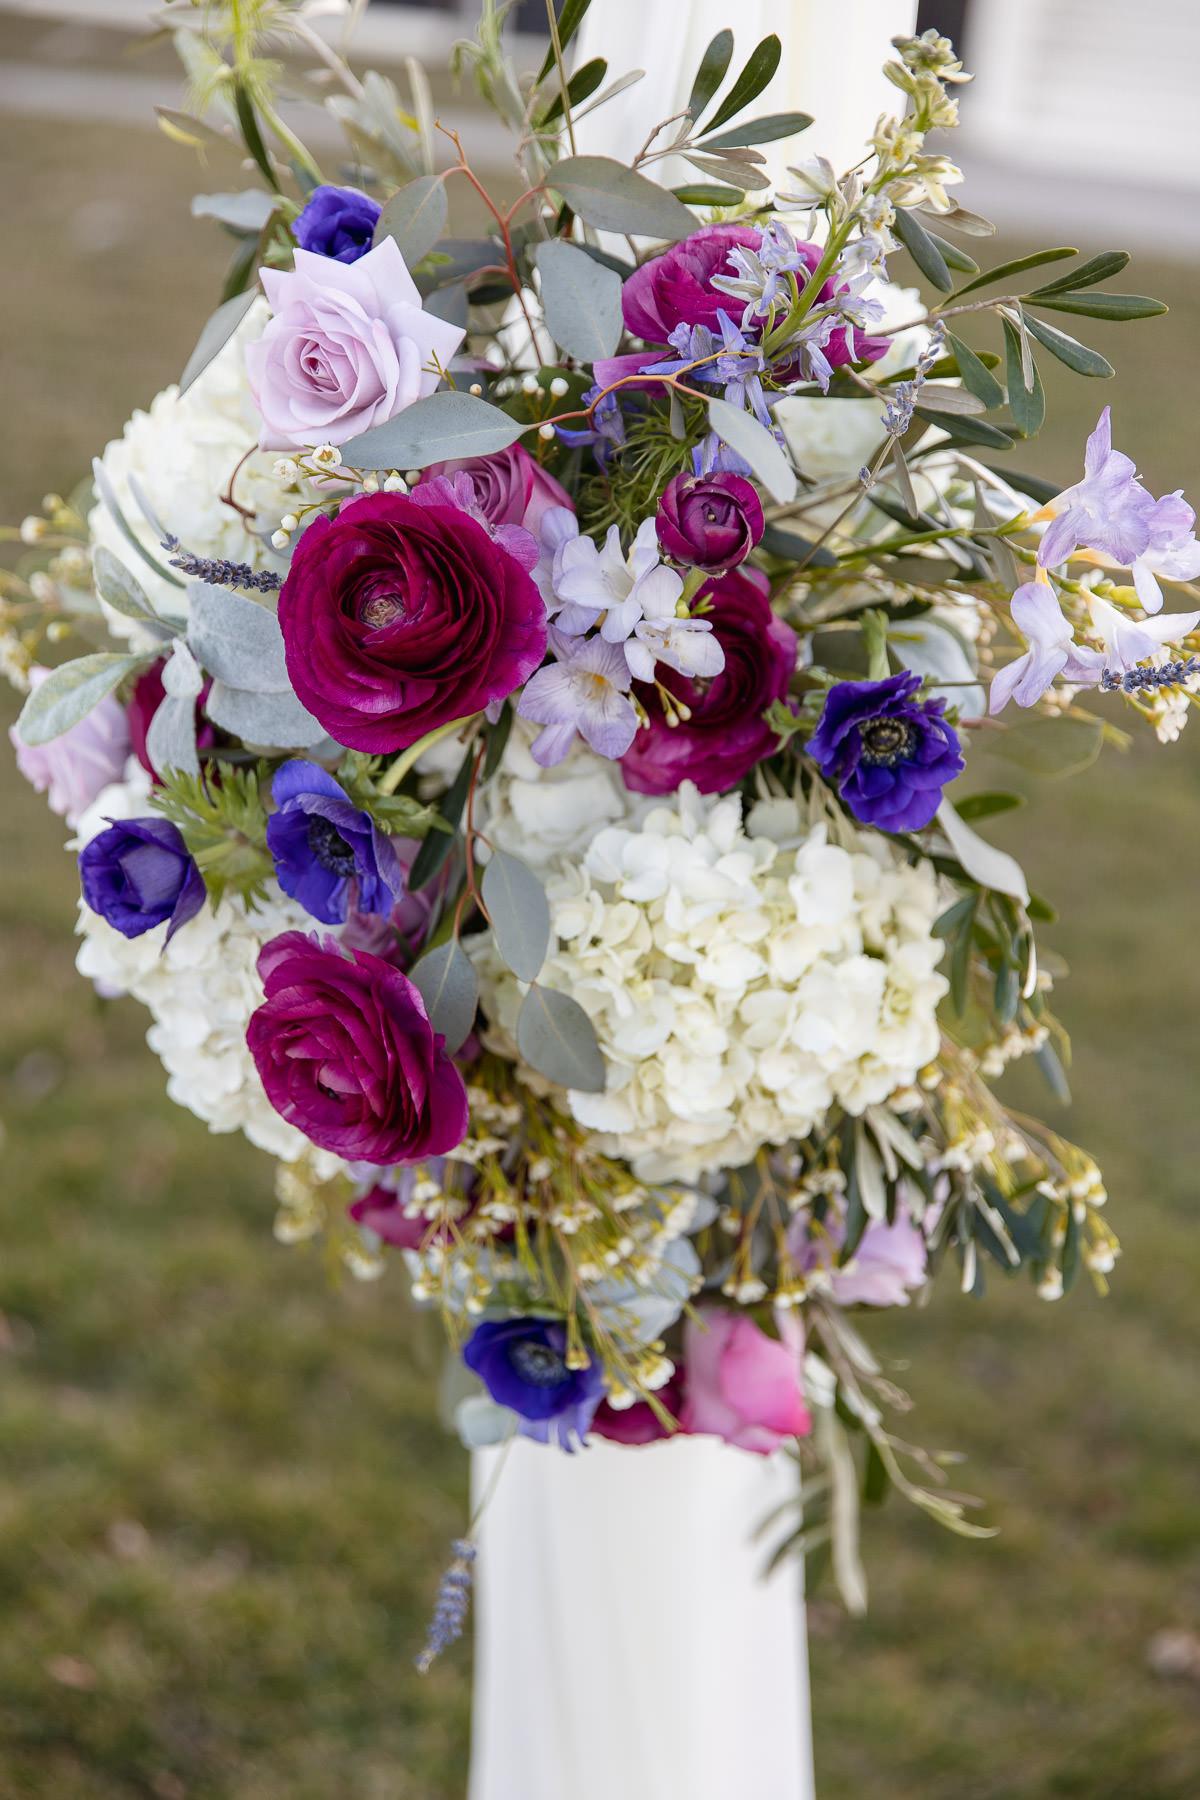 Eisenhower House, Newport, Rhode Island, Tracy Jenkins Photography, wedding, LGBTQ+, LGBT, Gay, Inclusive, Photography, Wedding photography, flowers